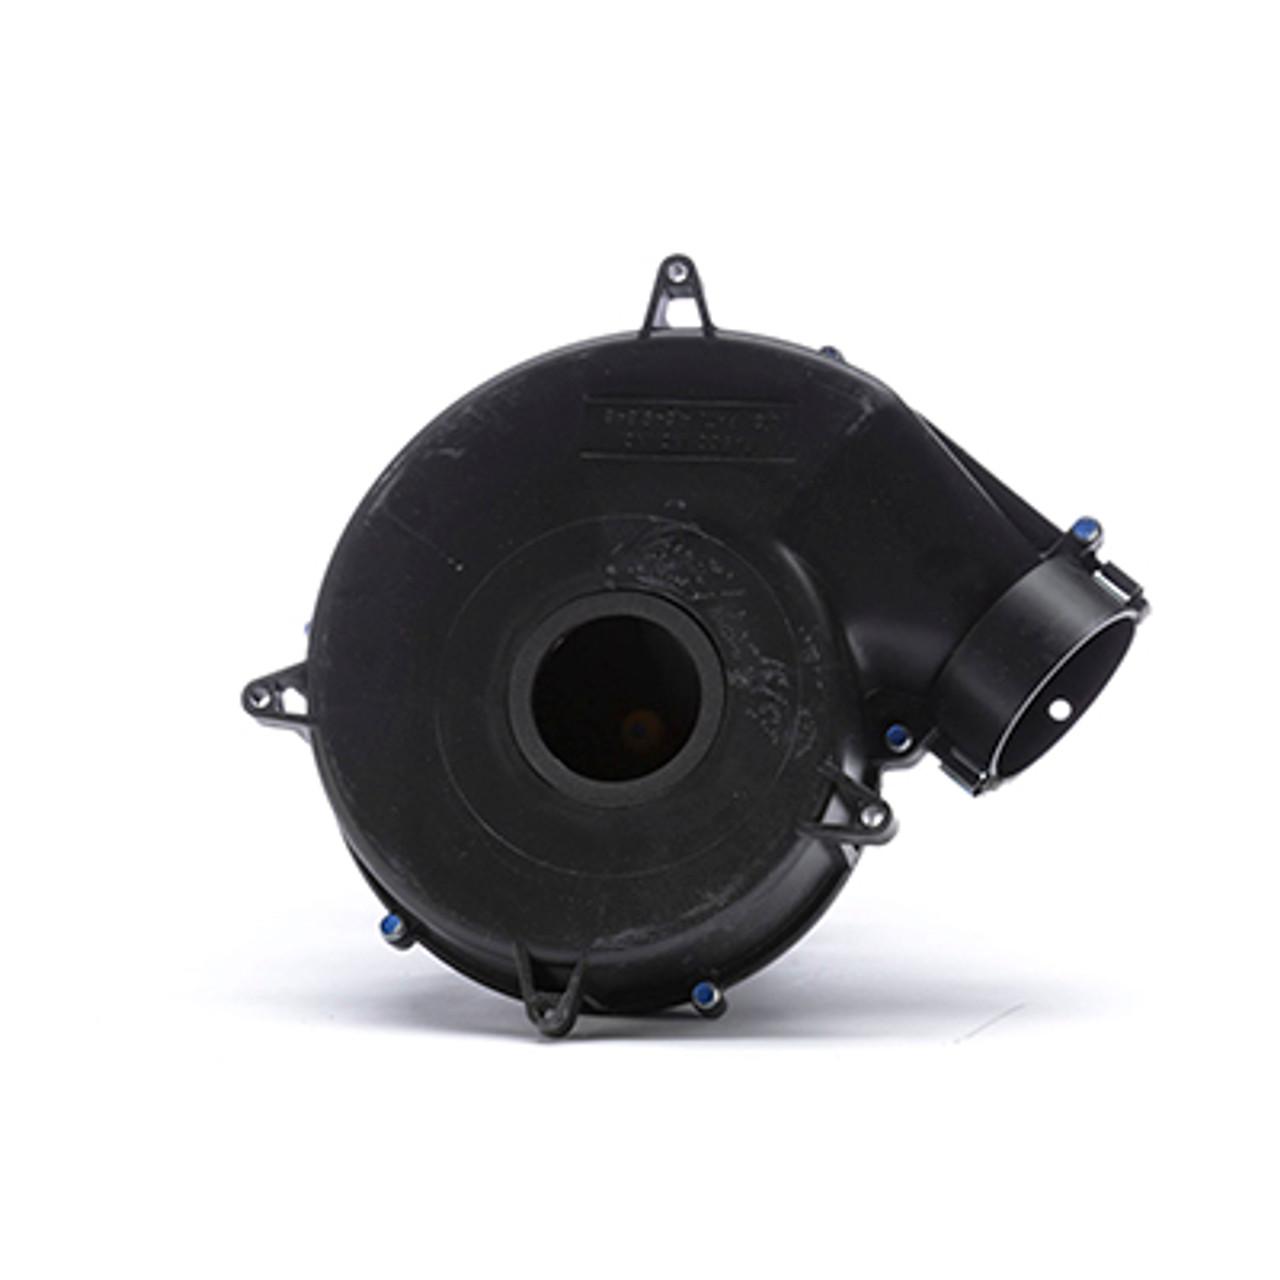 FASCO 71623861E Draft Inducer Blower Motor Assembly 70623861 70-24033-01-13